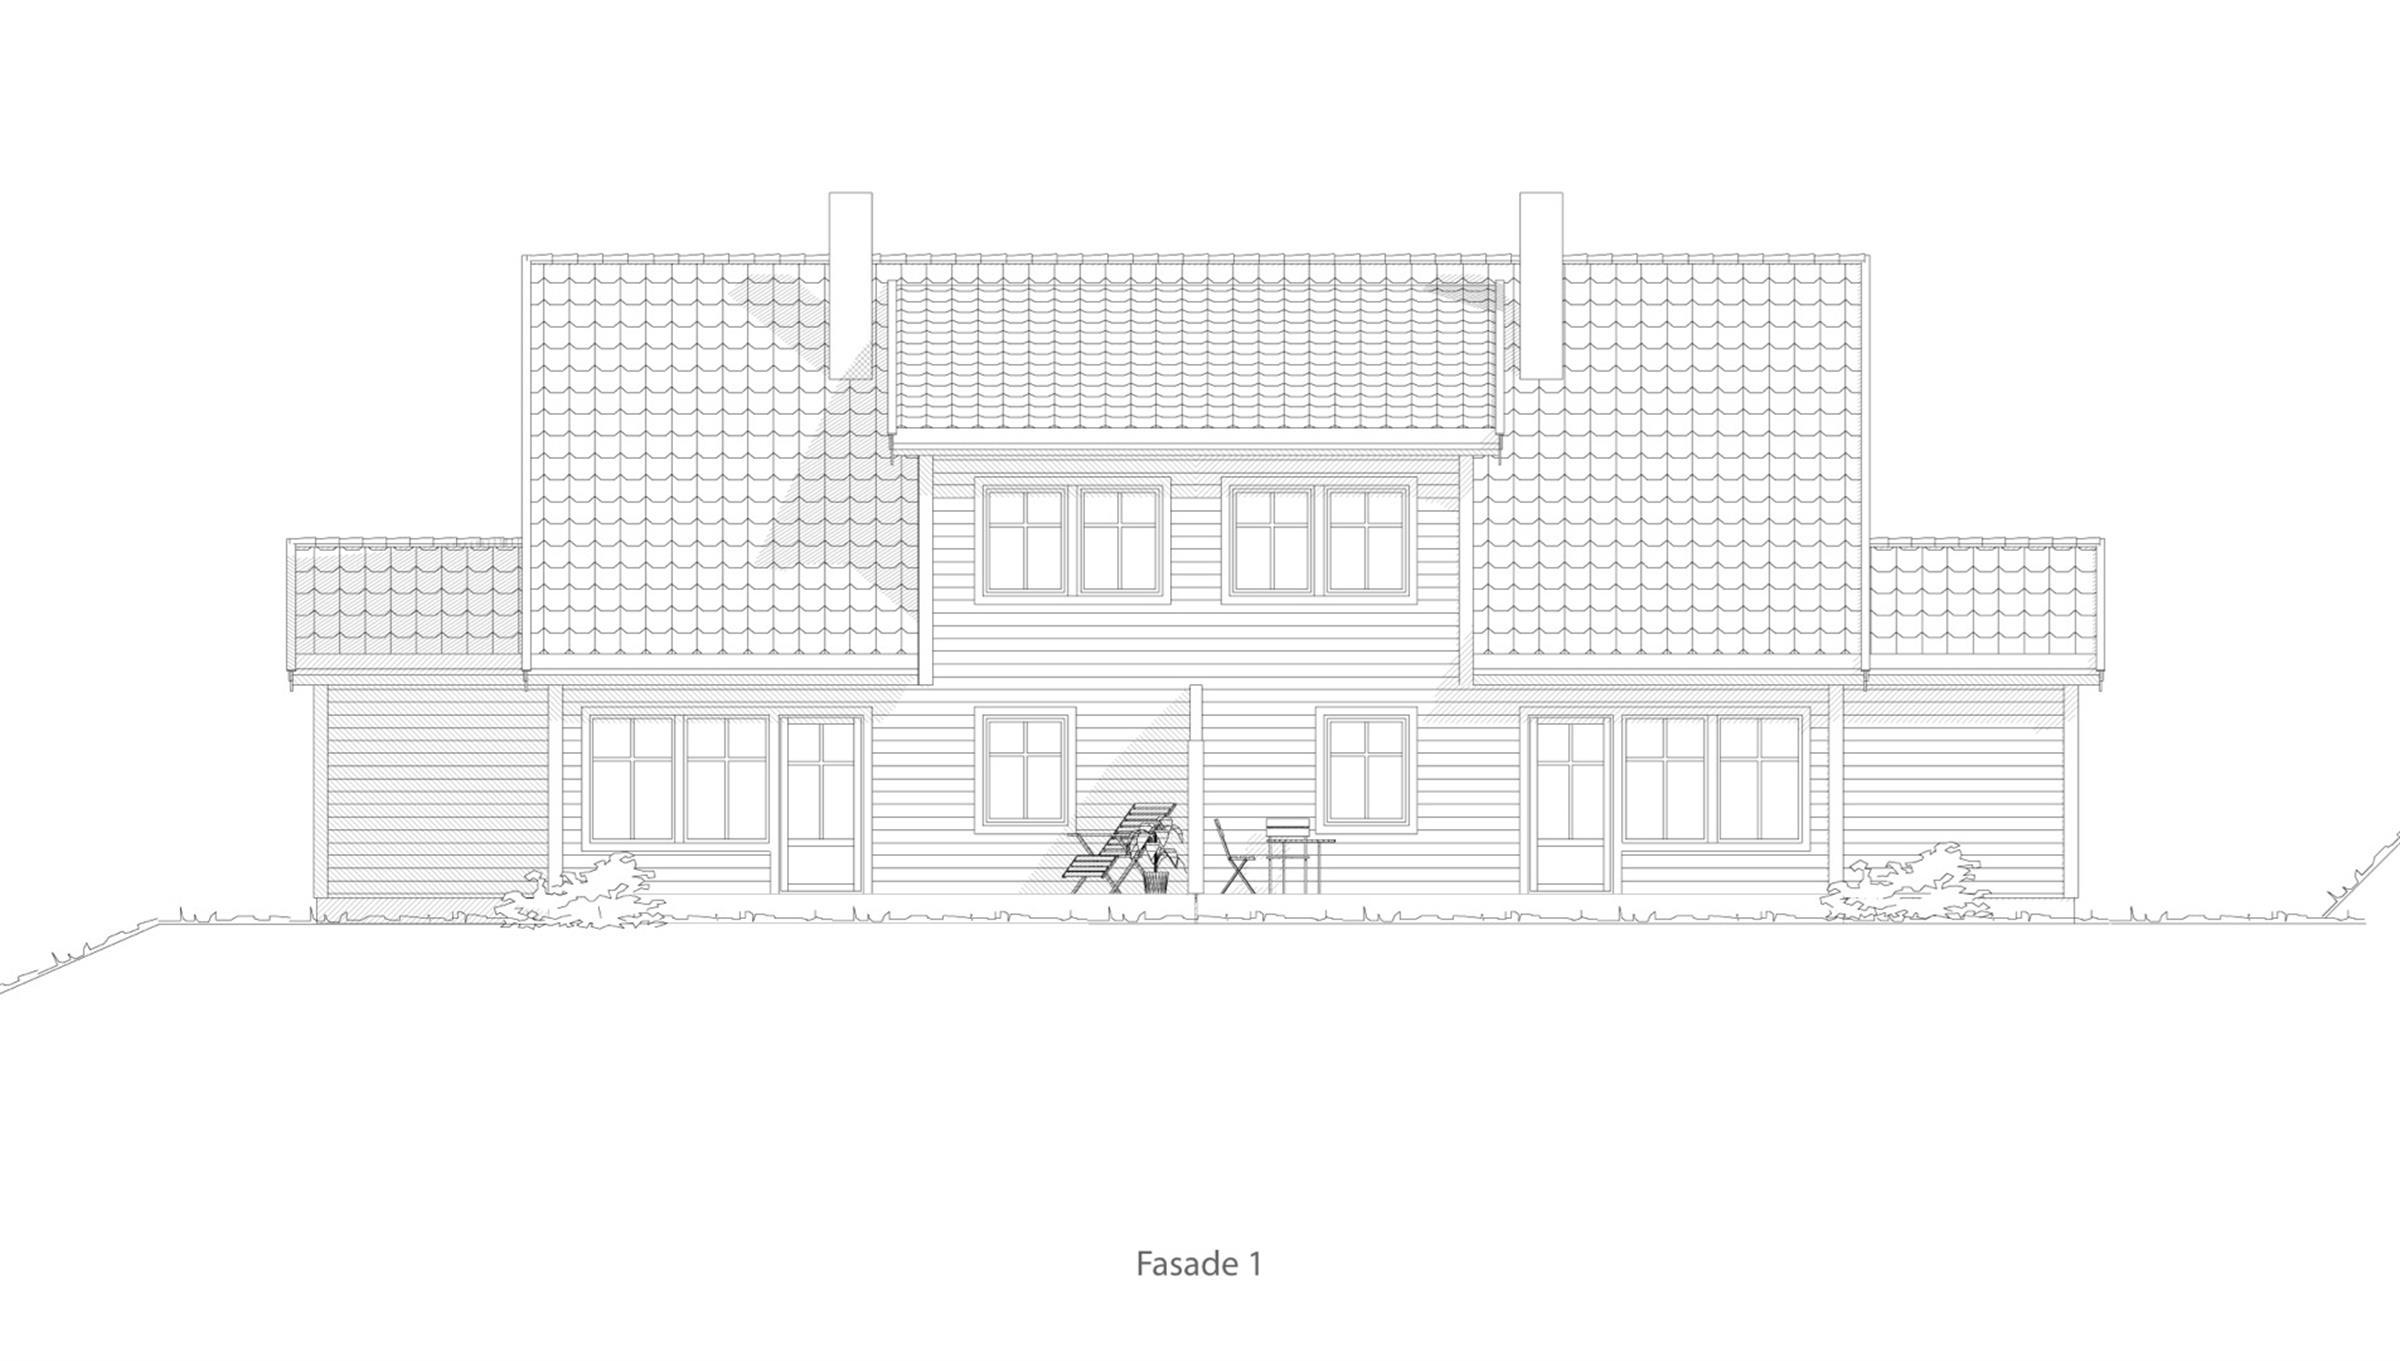 Elverum fasade 1